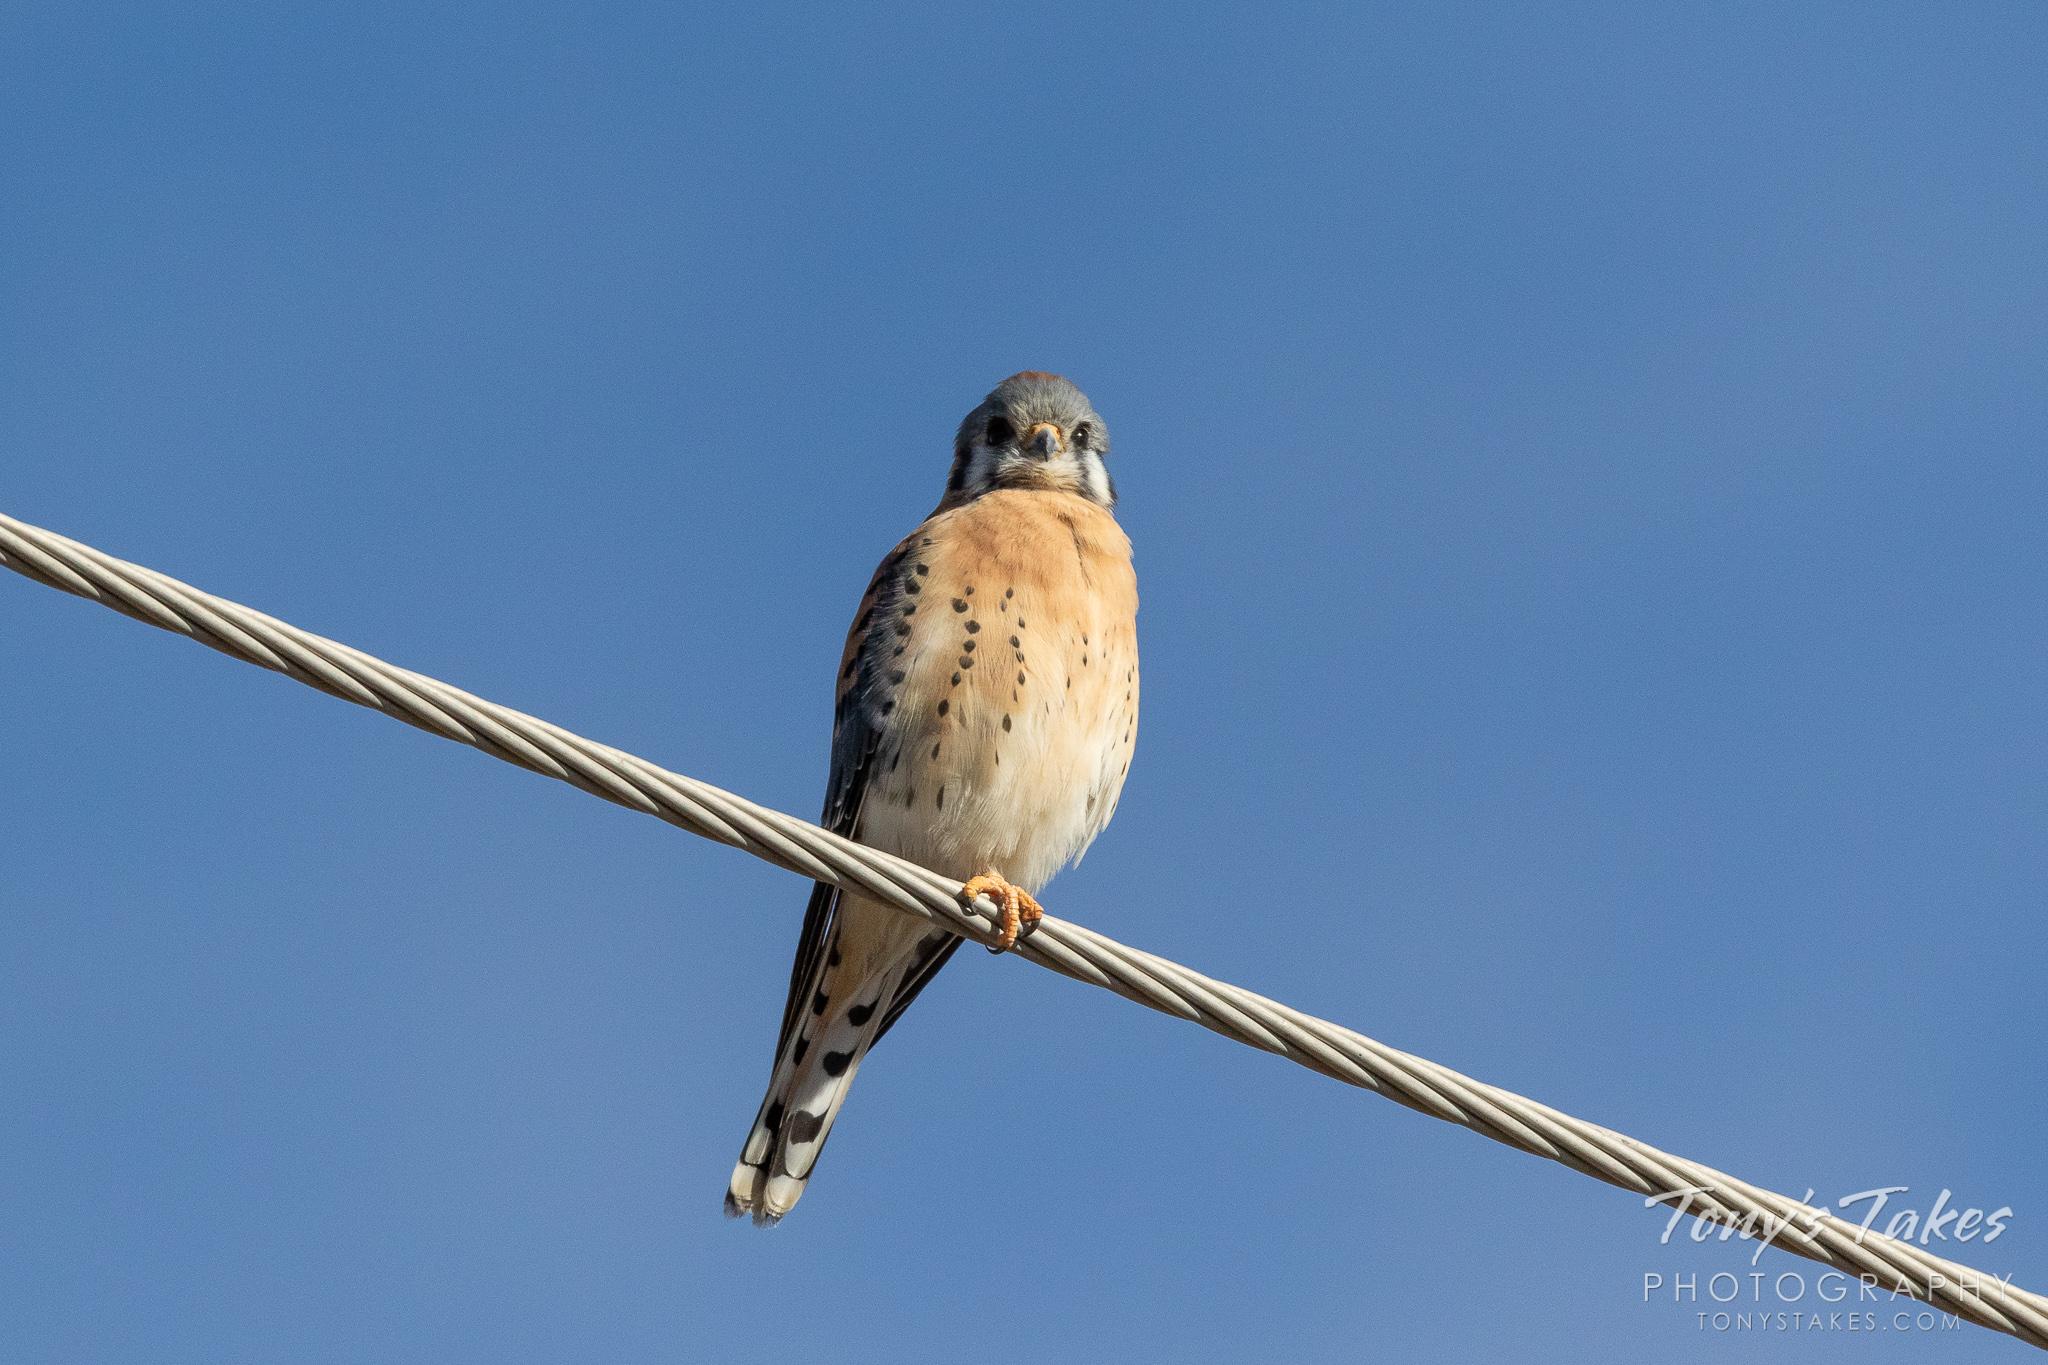 American Kestrel on the wire